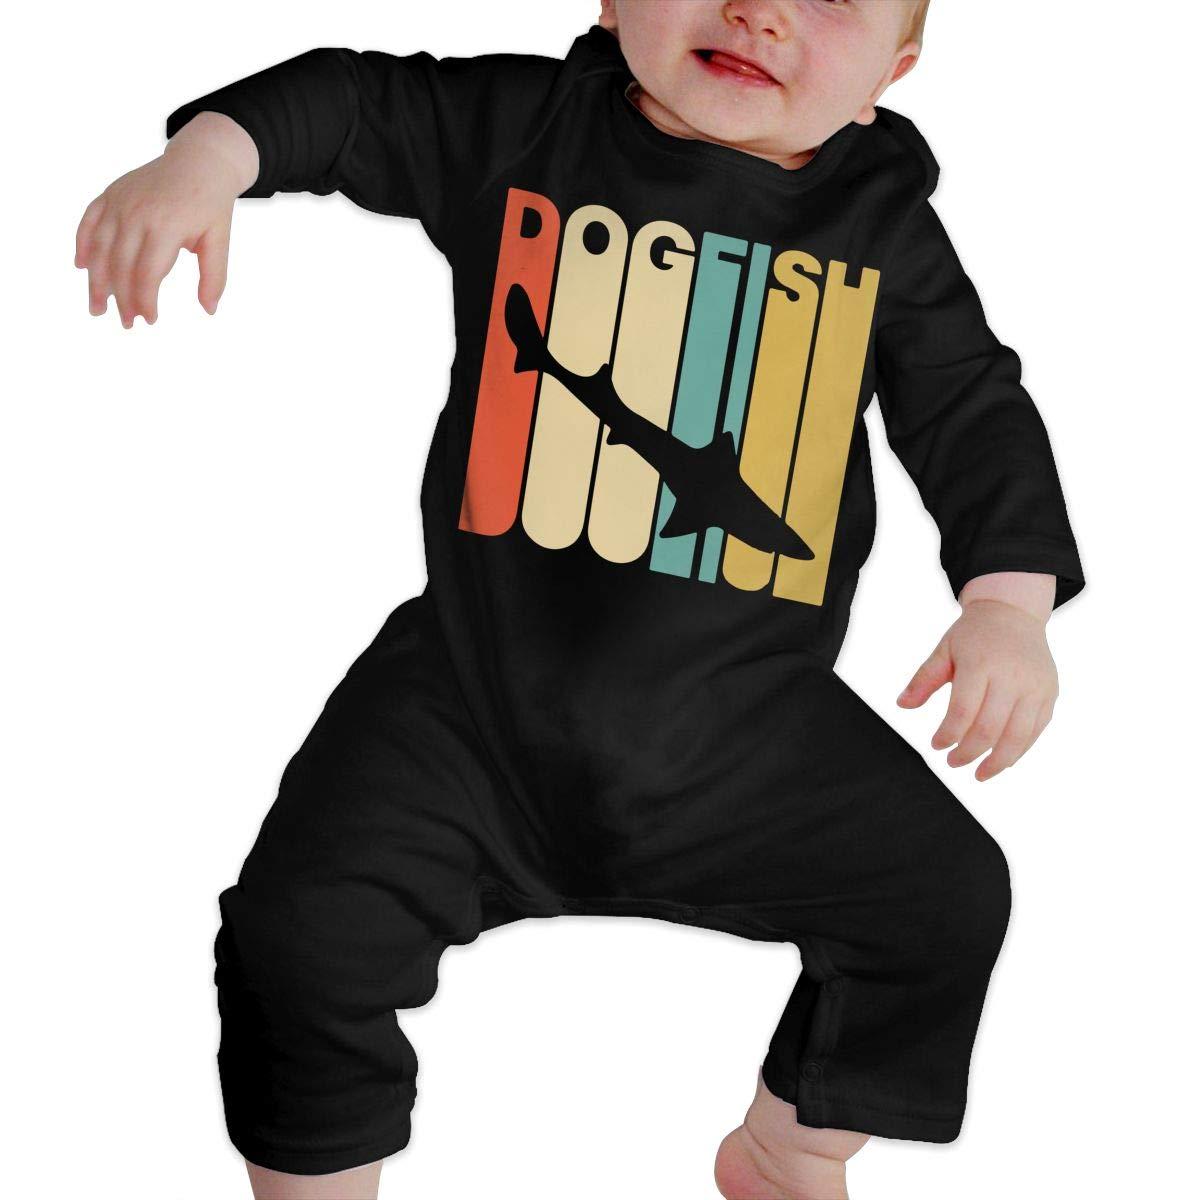 Vintage Style Dogfish Newborn Baby Long Sleeve Romper Jumpsuit Infant Romper Jumpsuit